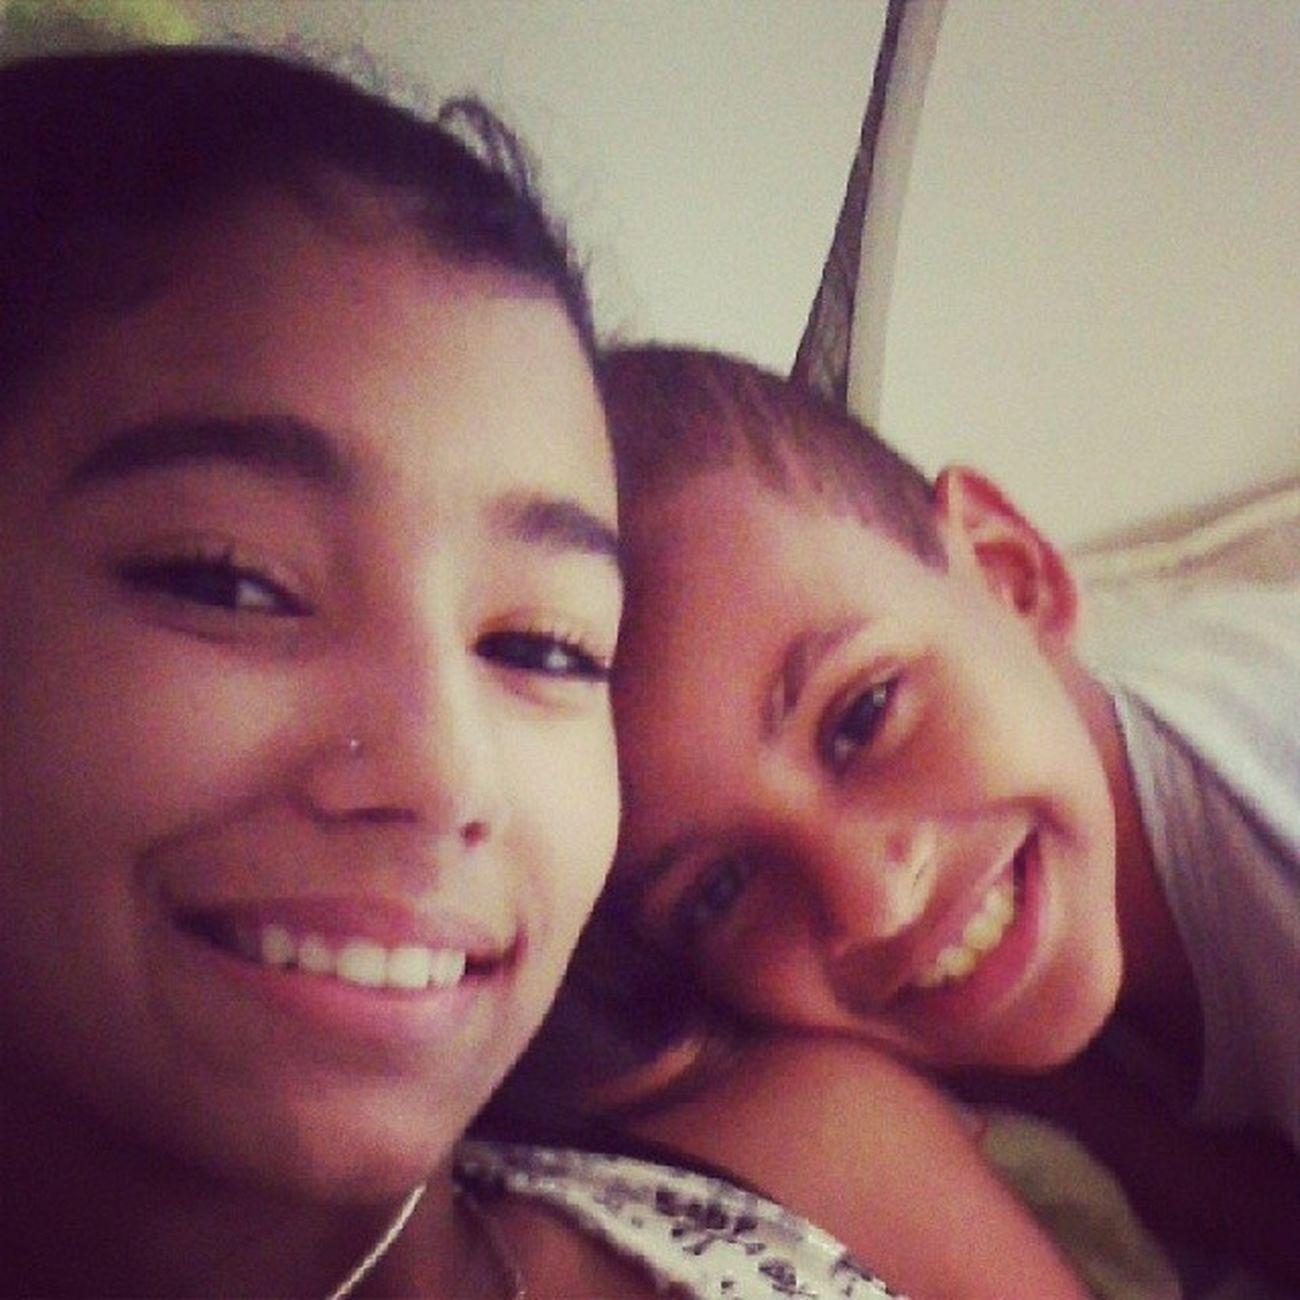 Criança legal,como desliga? Instalikes Boatarde Chato InstaComments